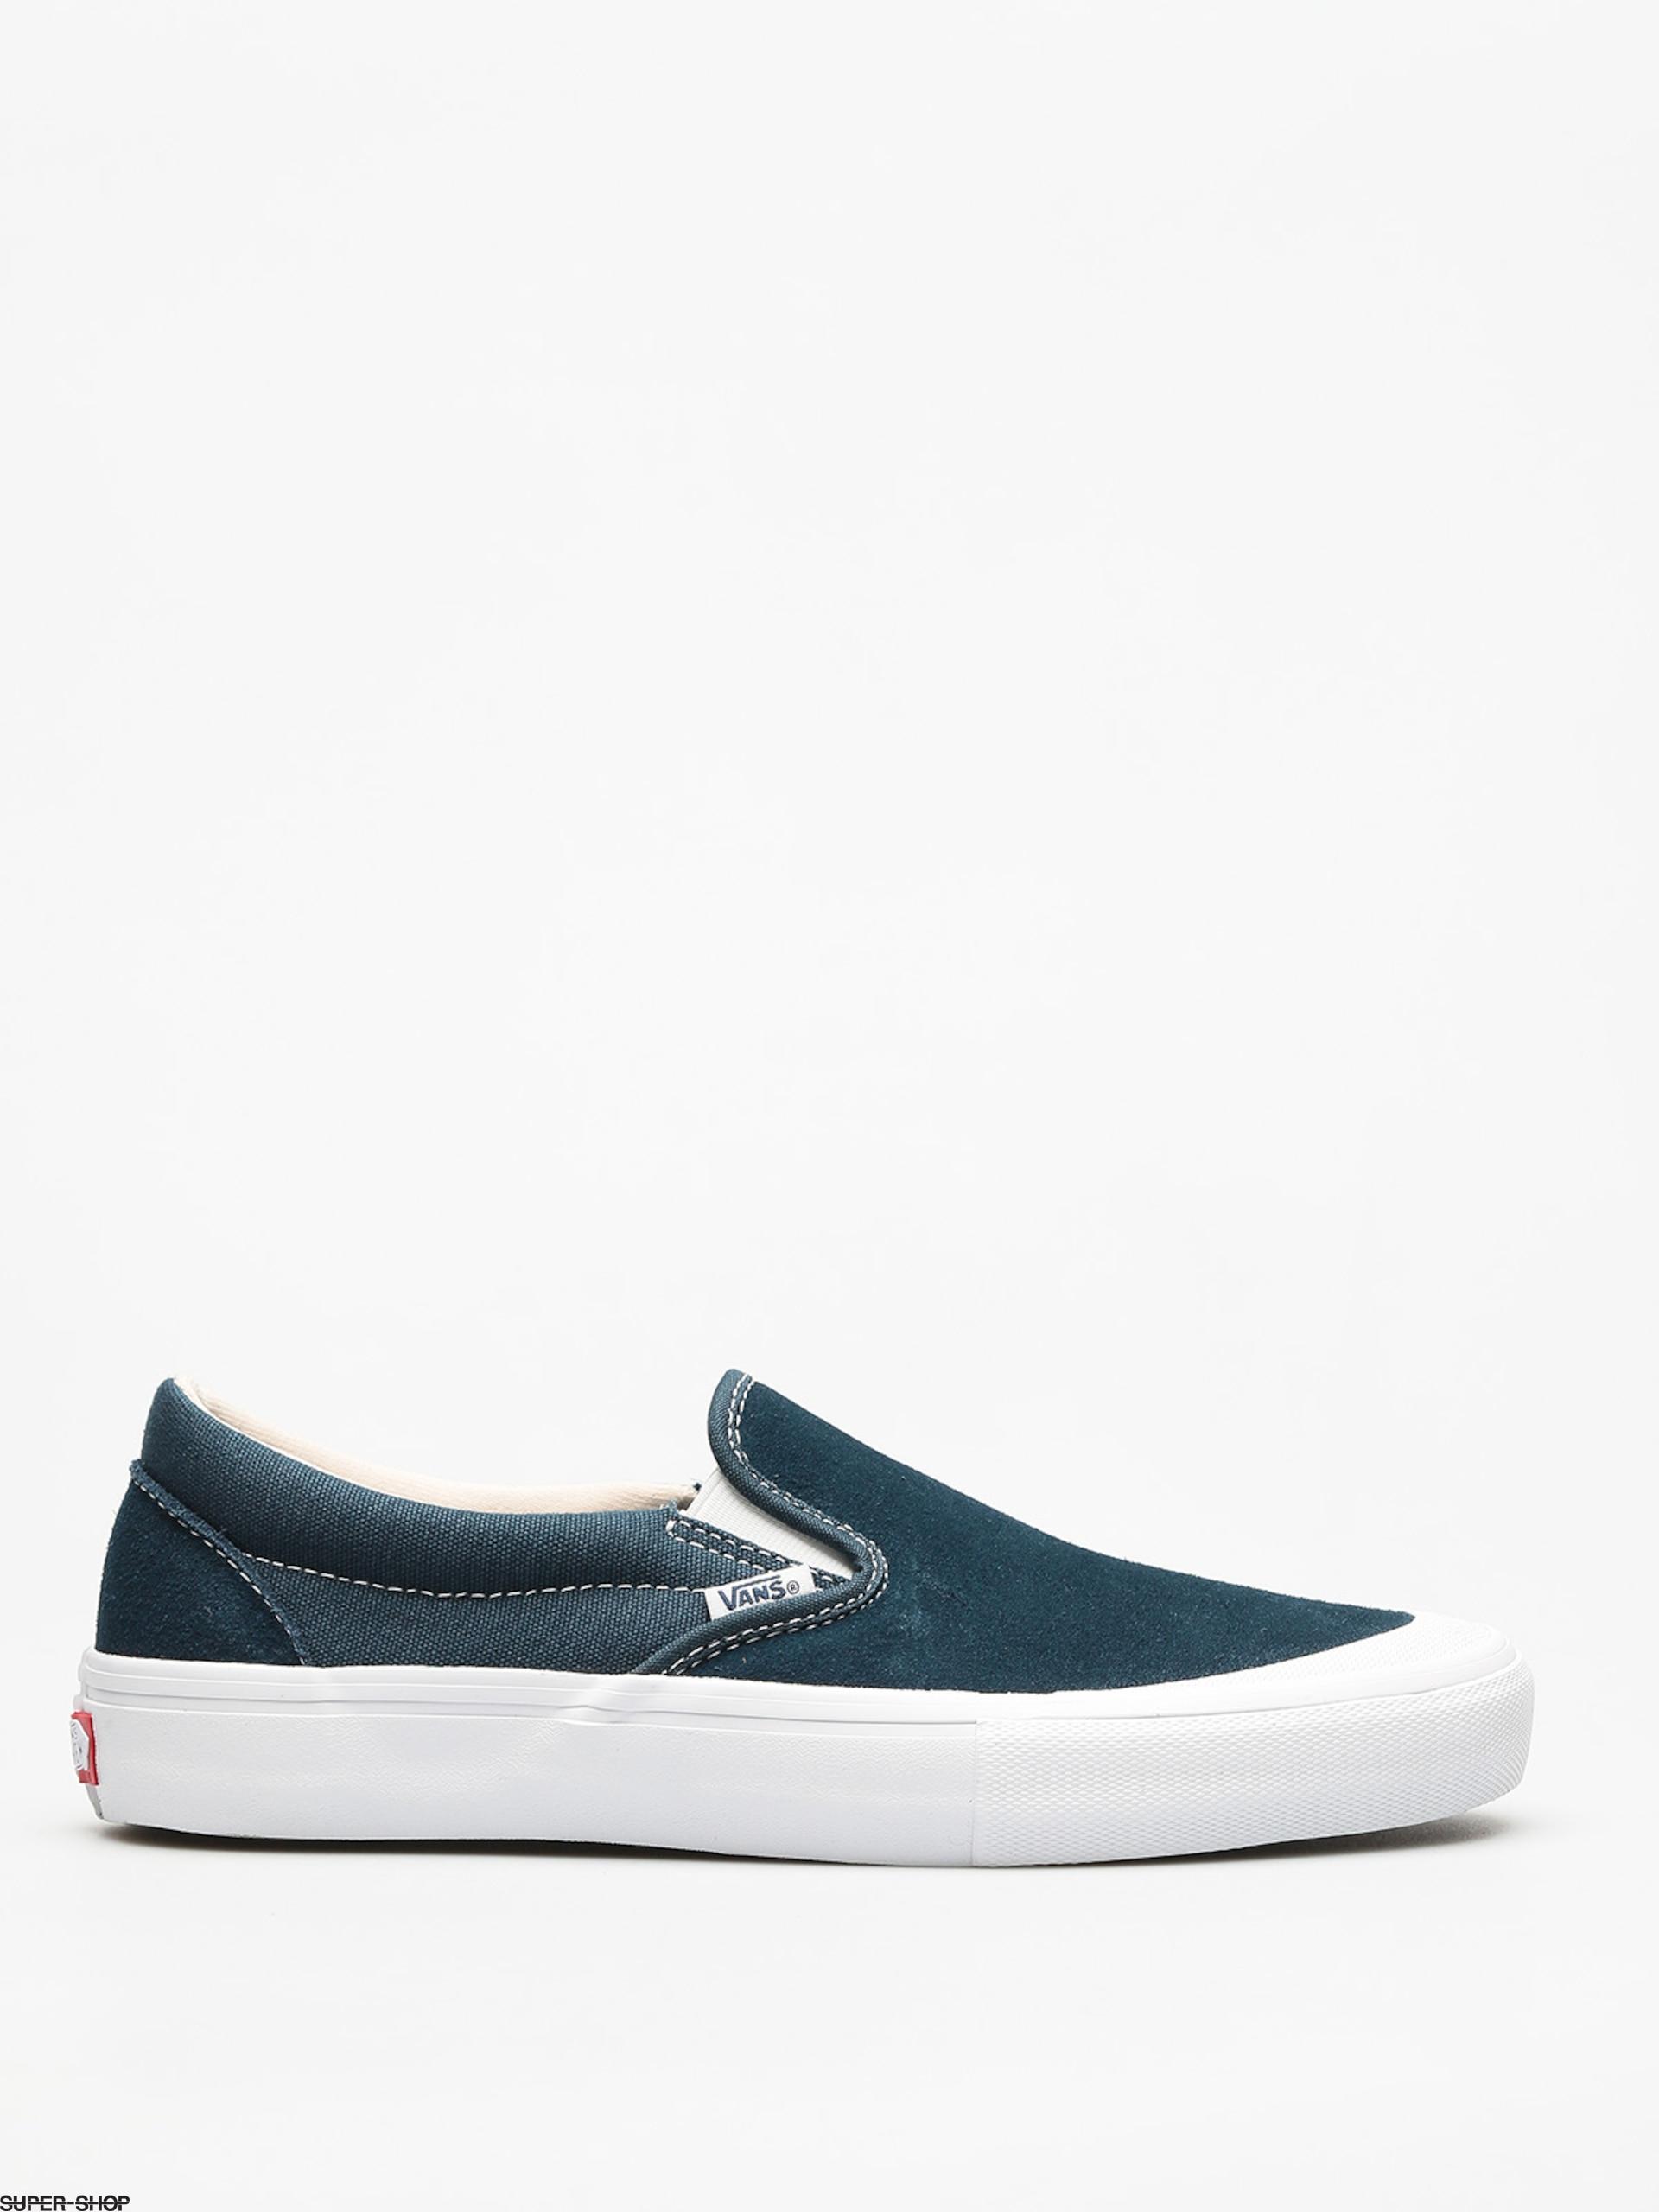 best service 178ae 807be Vans Schuhe Slip On Pro (toe cap/reflecting/pond)